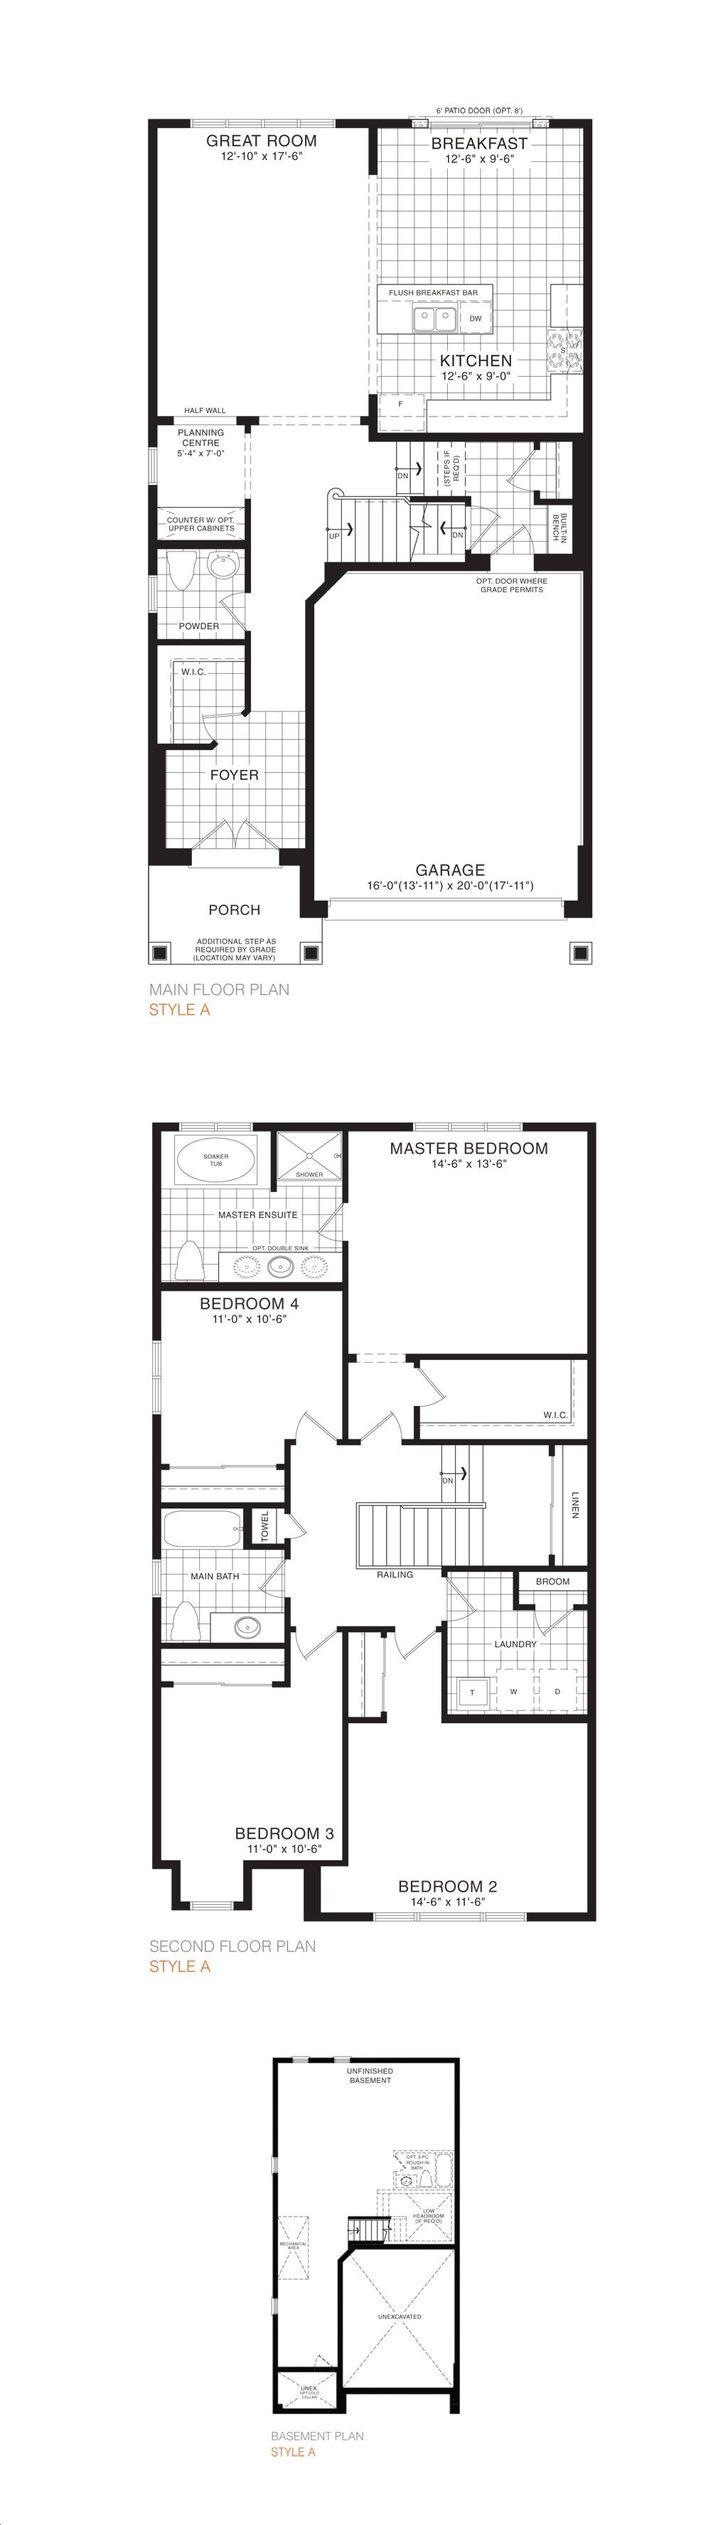 Empire Avalon By Empire Camrose 33 Detached Floorplan 4 Bed 2 5 Bath